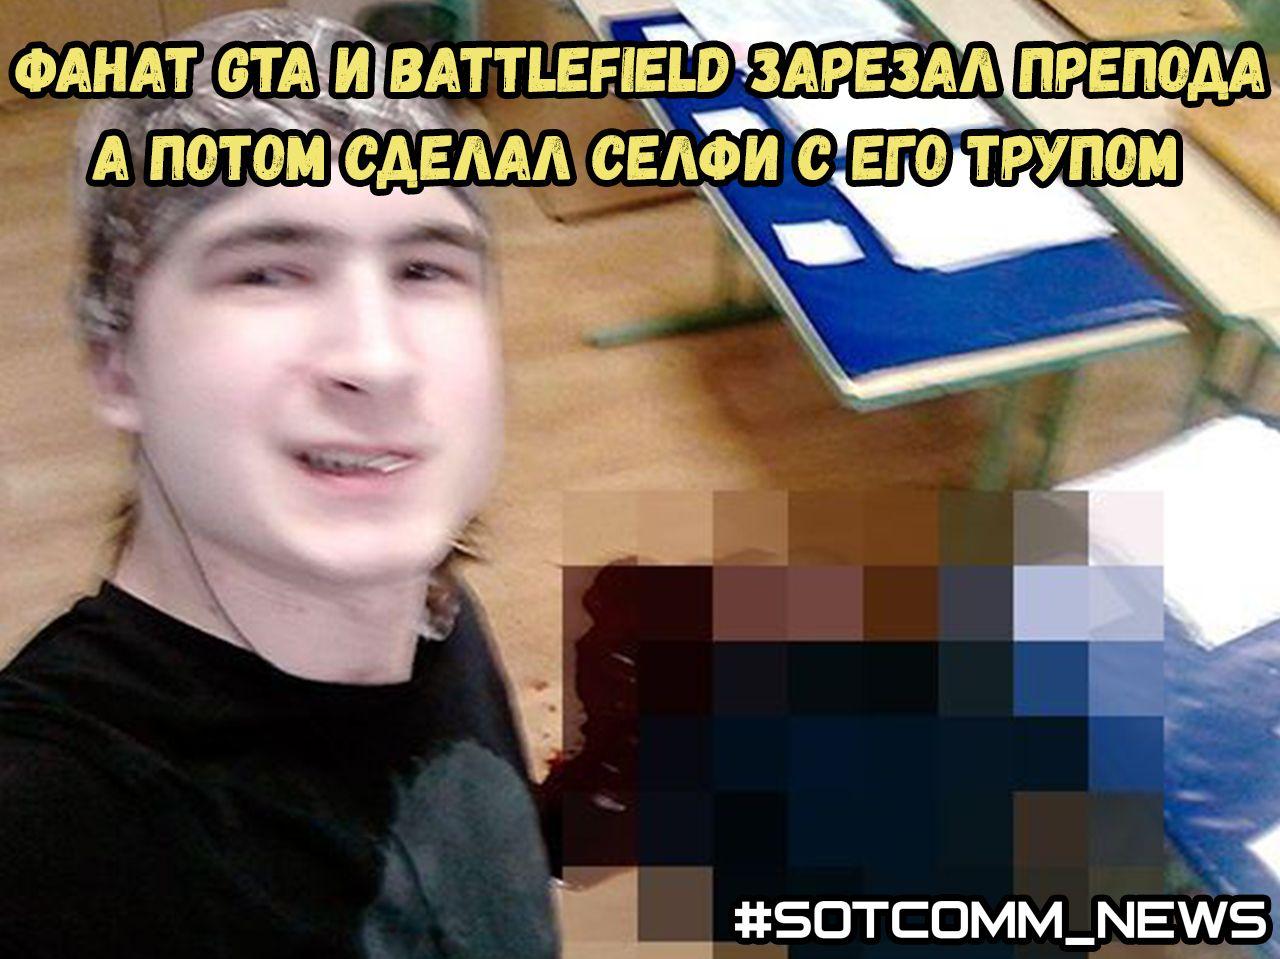 Фанат GTA и Battlefield зарезал преподавателя сделав селфи с его трупом